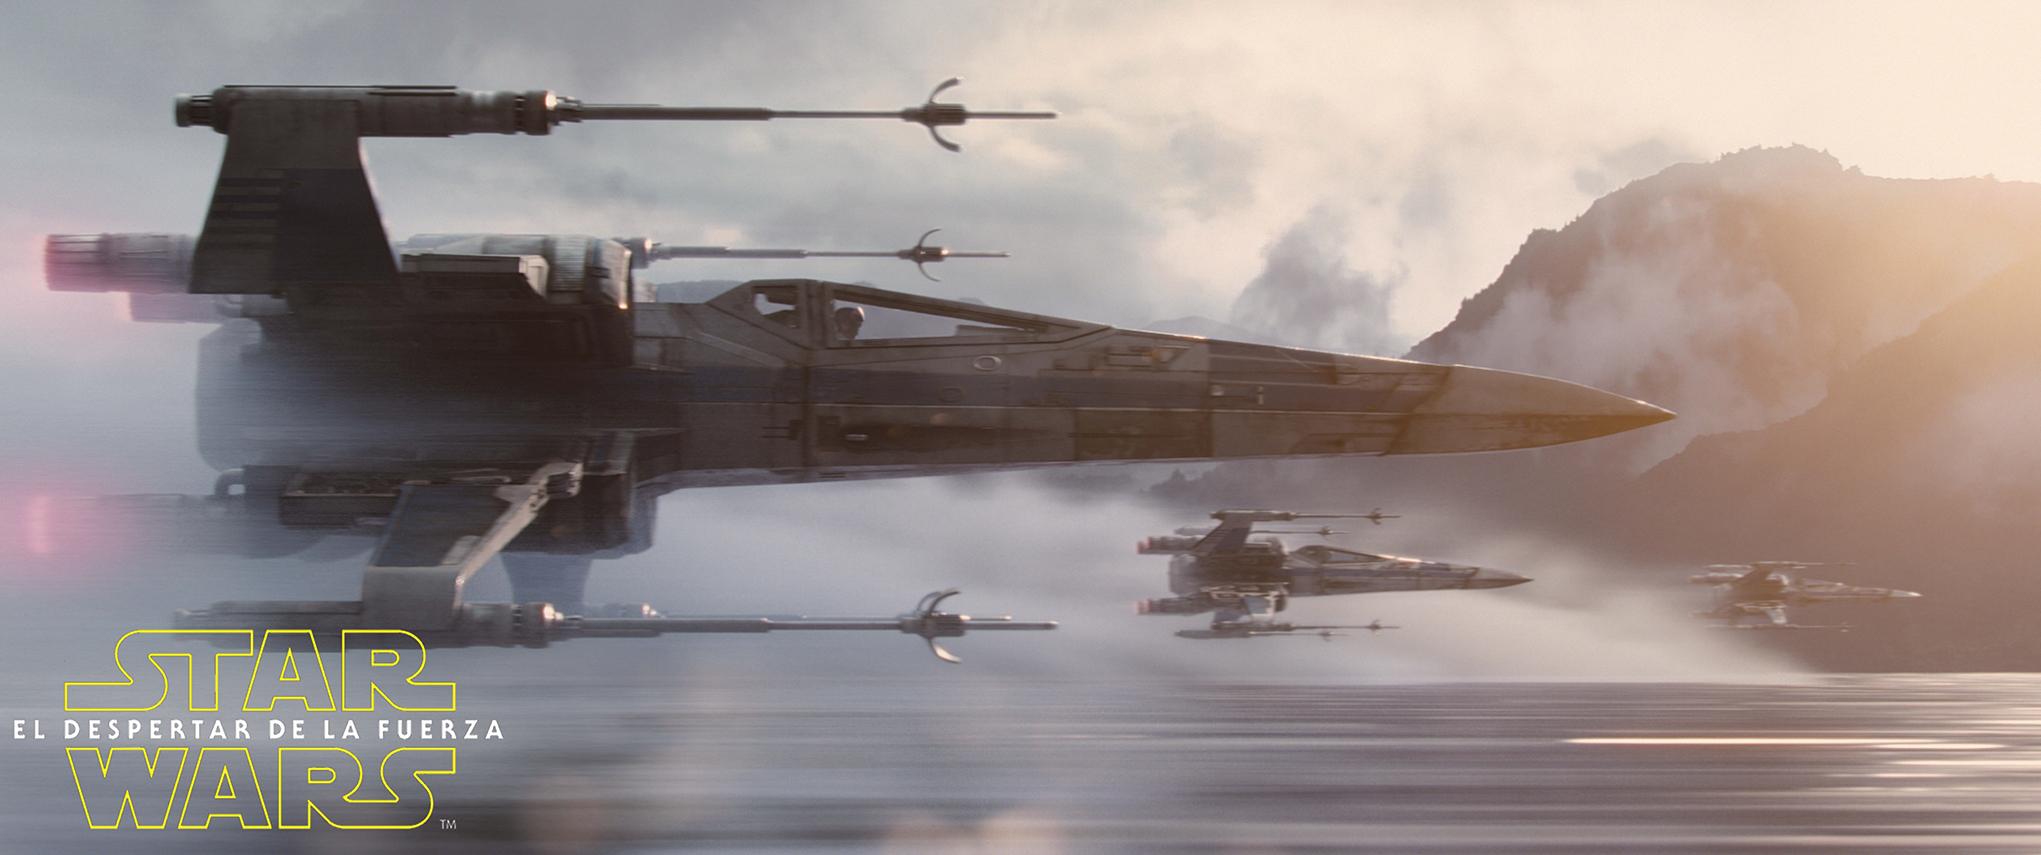 Star Wars The Force Awakens wallpaper 17